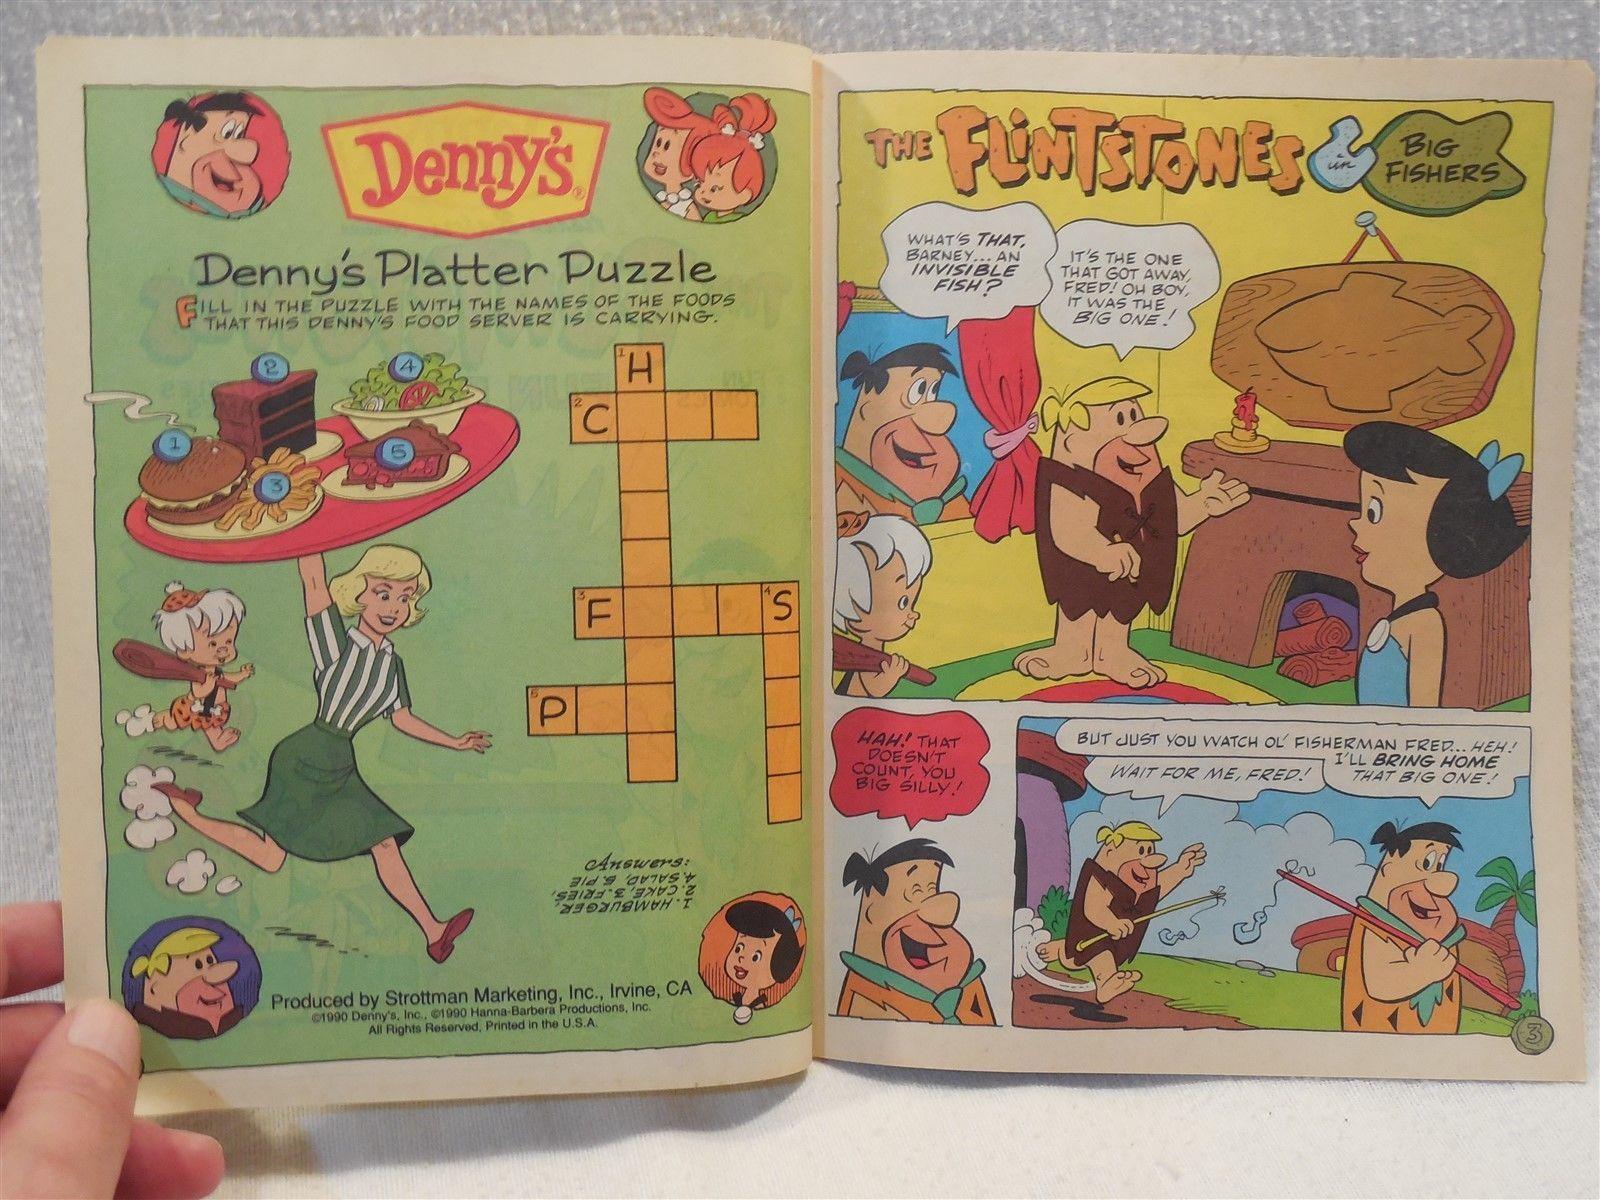 Flintstones 1990 Denny's Unused Fun Book - Comics, Puzzles, Games - Volume 21